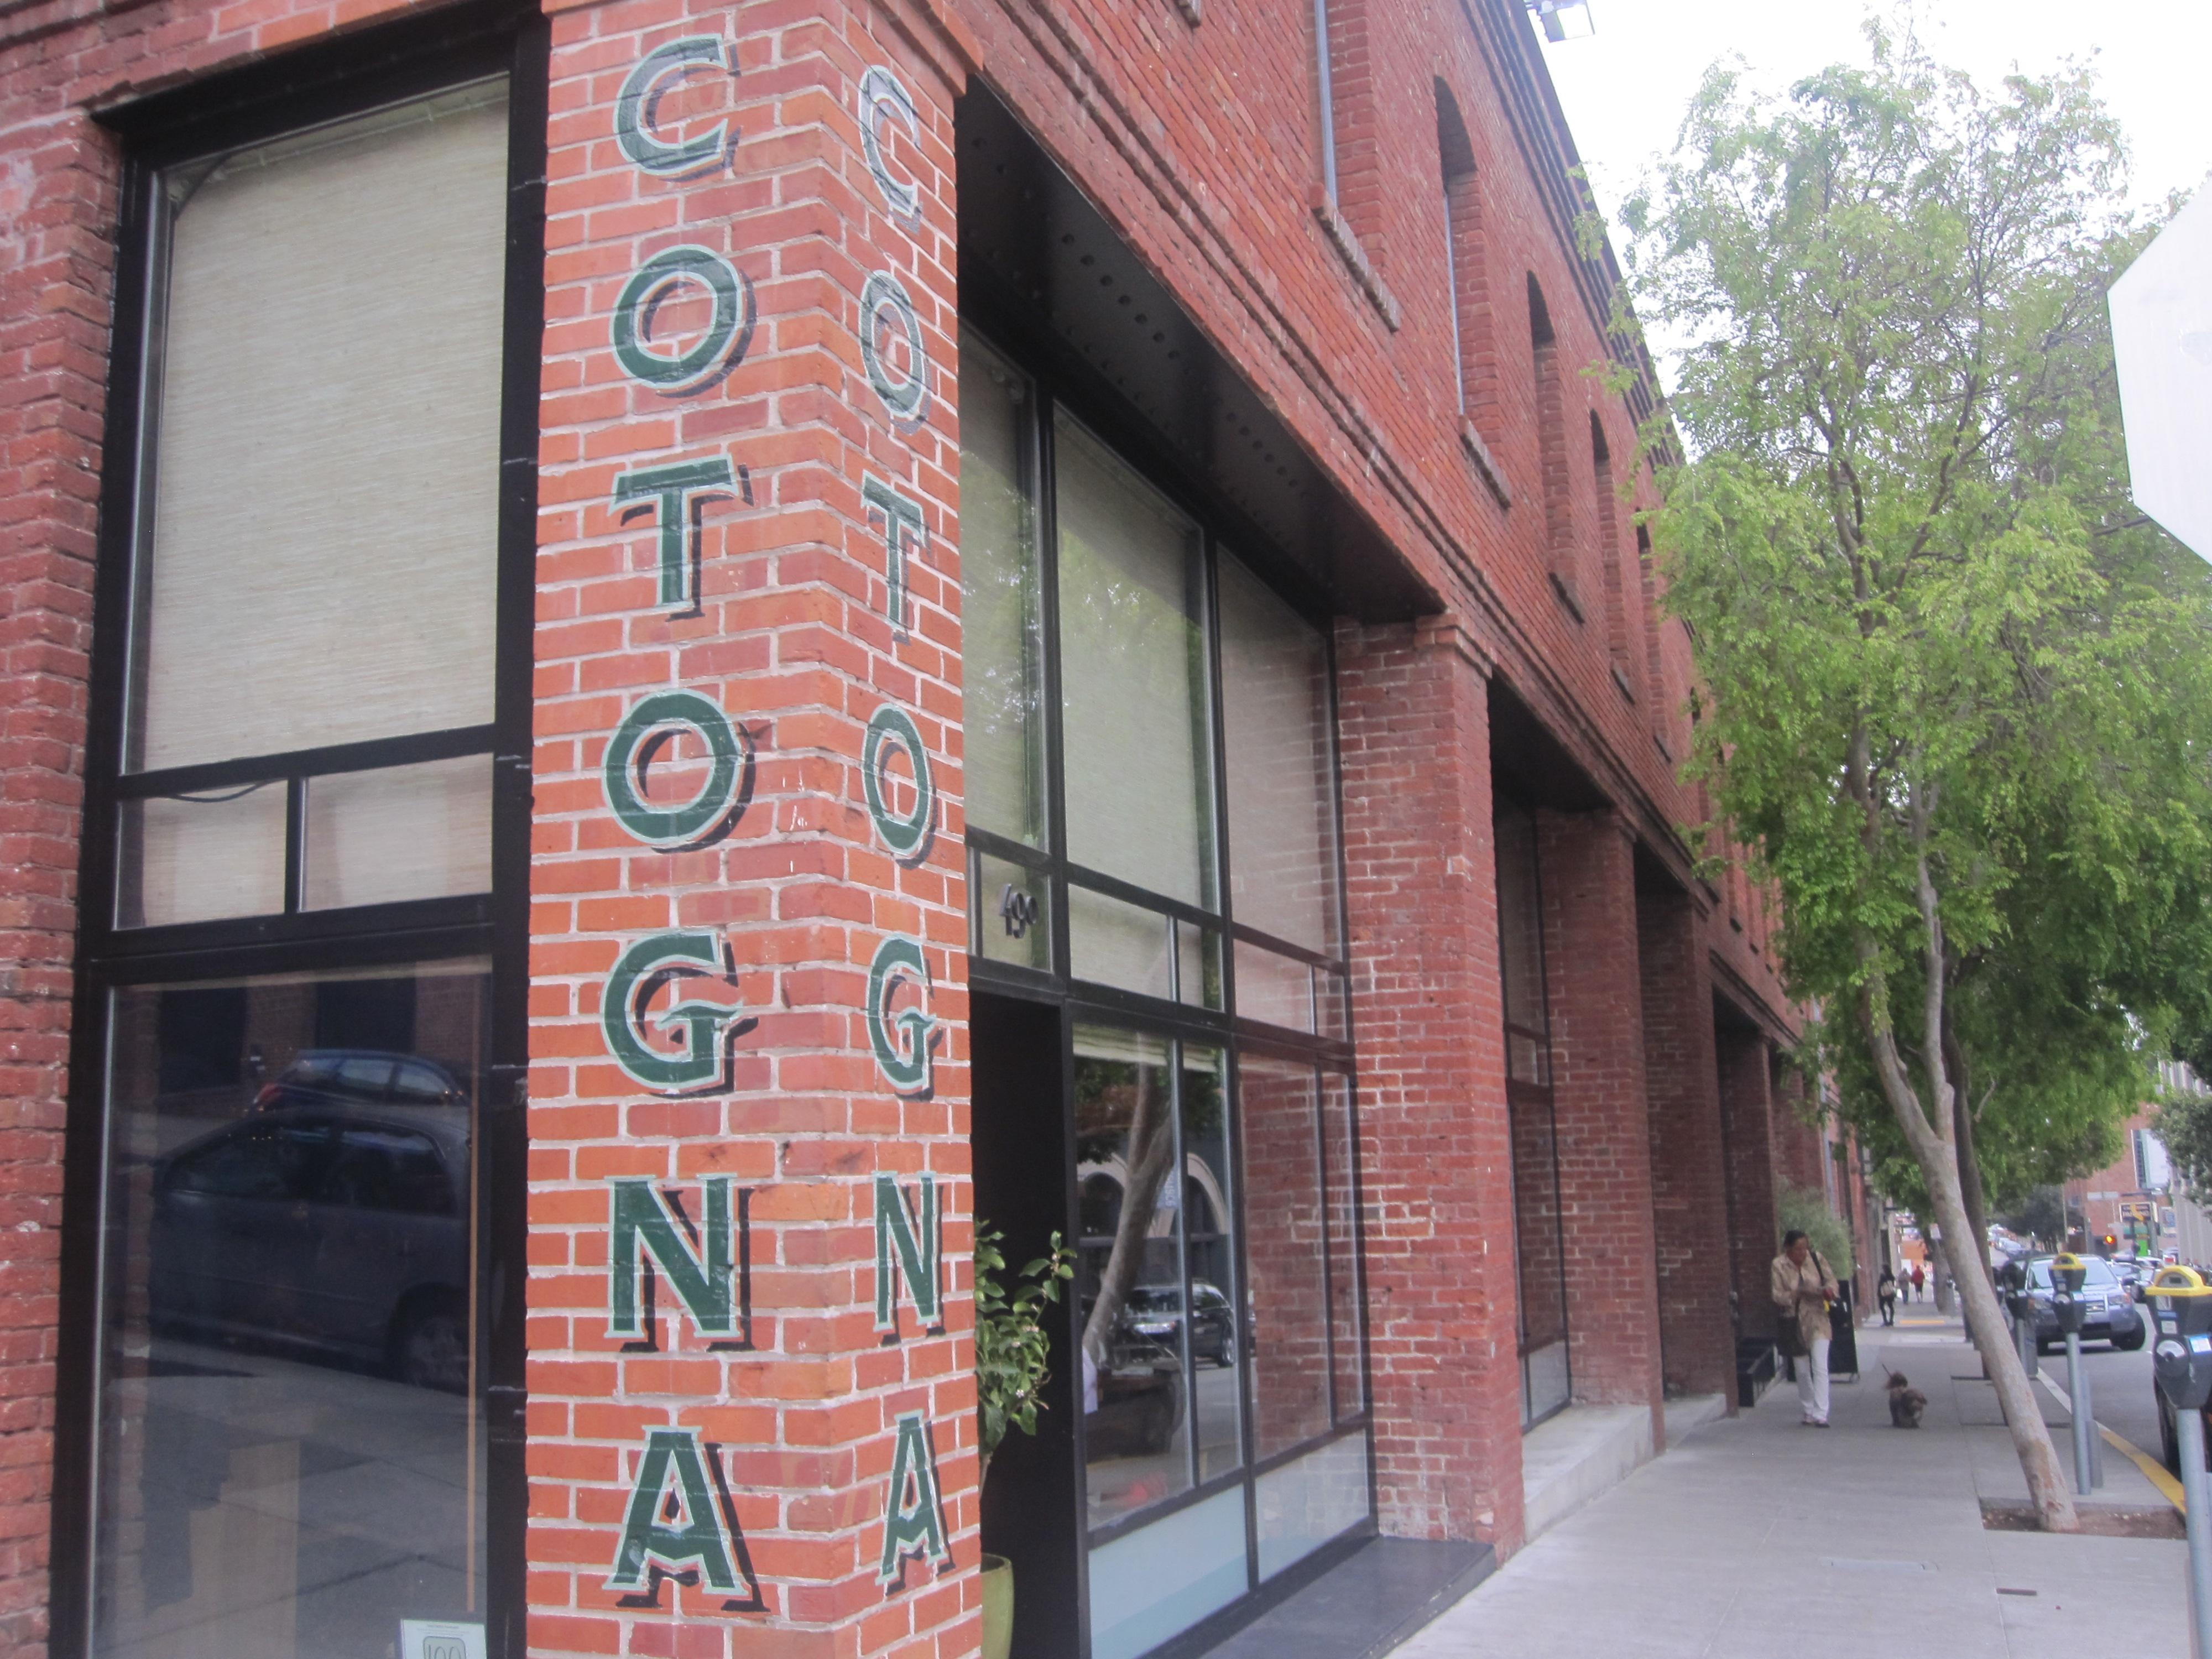 cotogna1